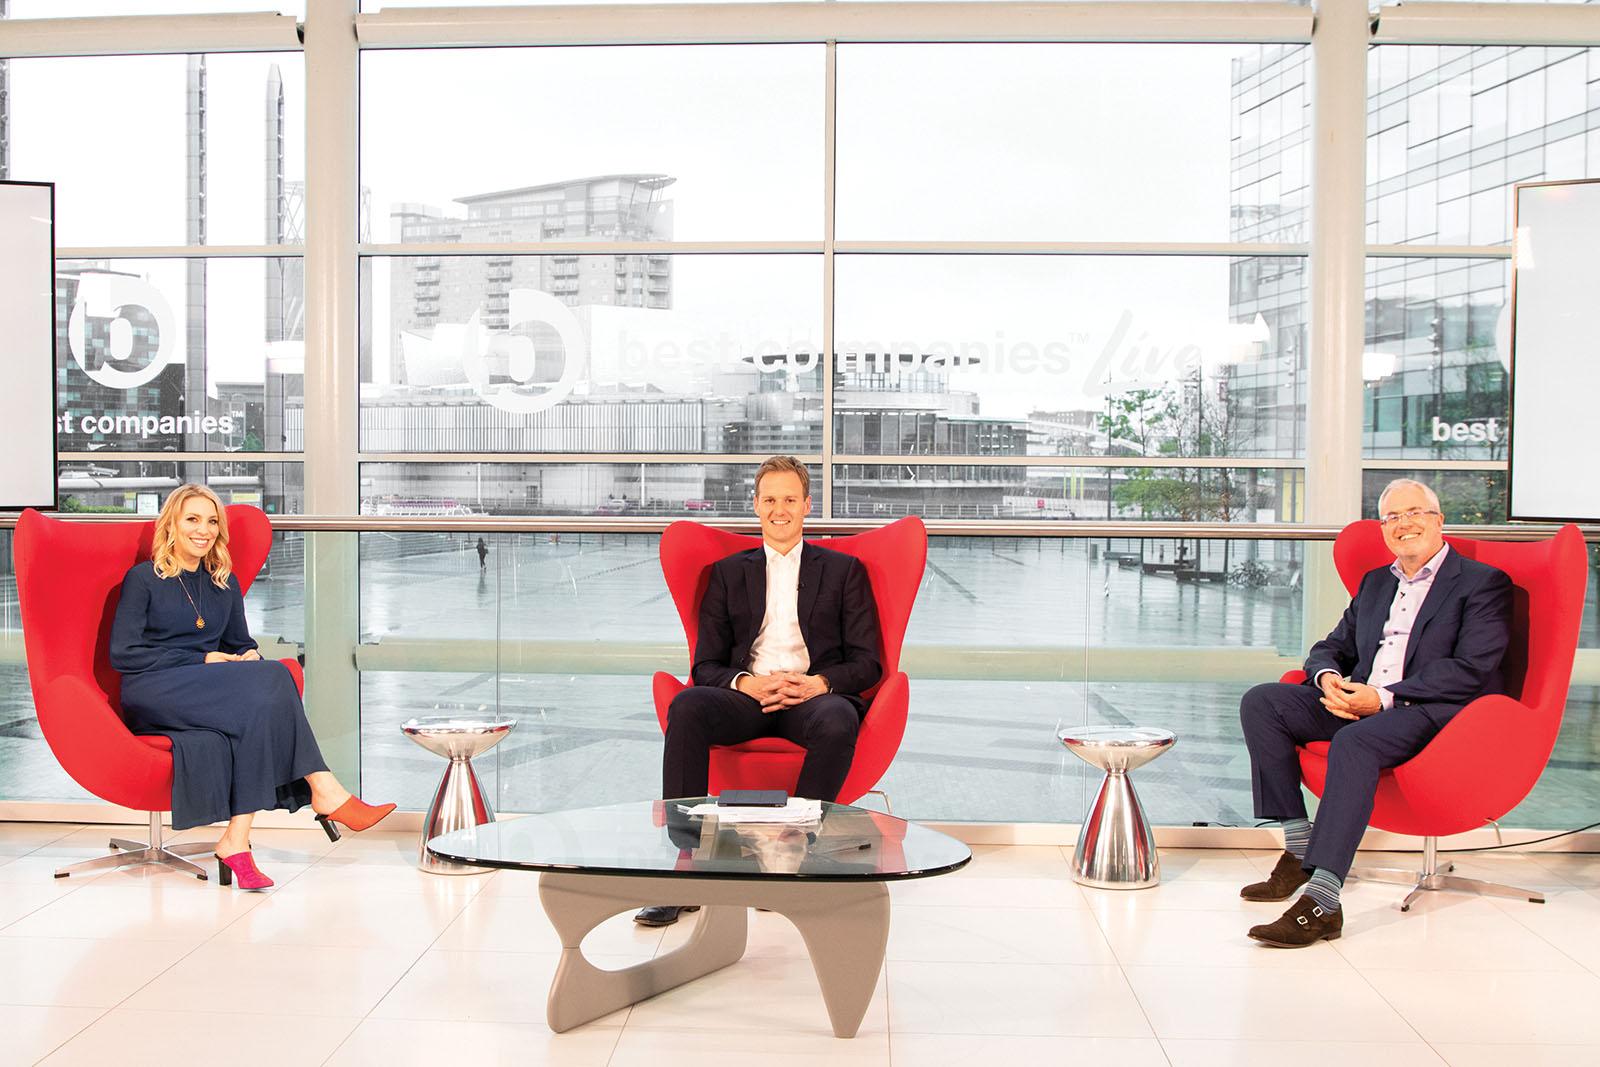 Actress Jemma Bolt, Presenter Dan Walker and Best Companies CEO Jonathan Austin on set at Best Companies Live